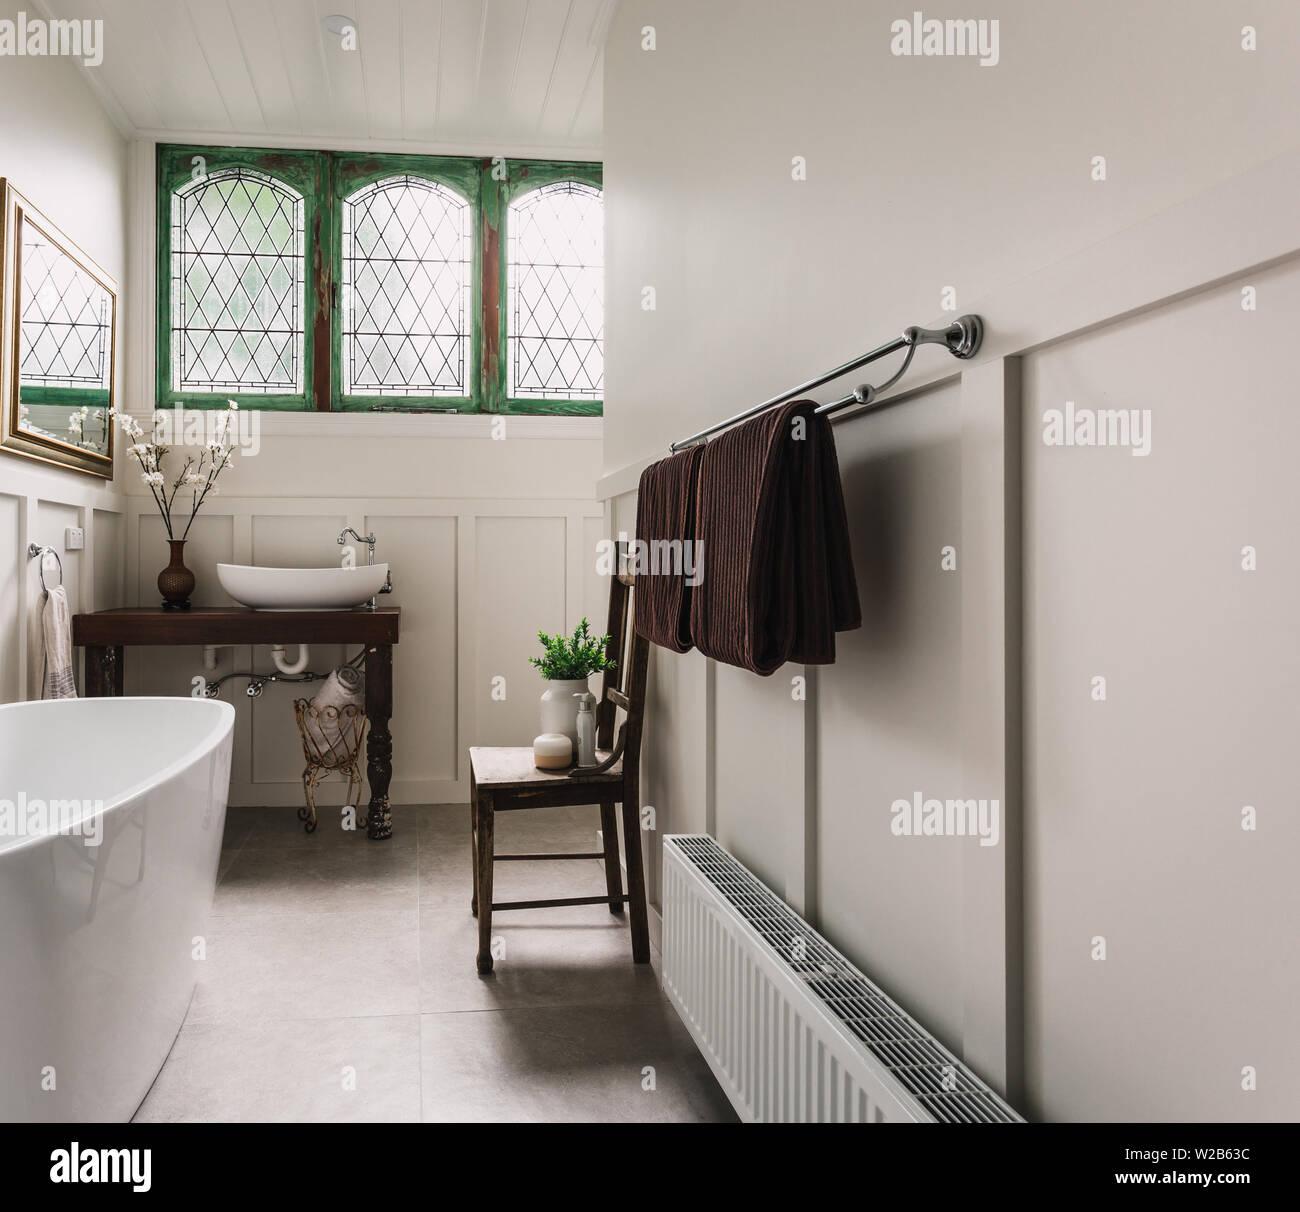 Country Bathroom With Bath Gold Mirror Green Historic Double Casement Headlight Window Stock Photo Alamy